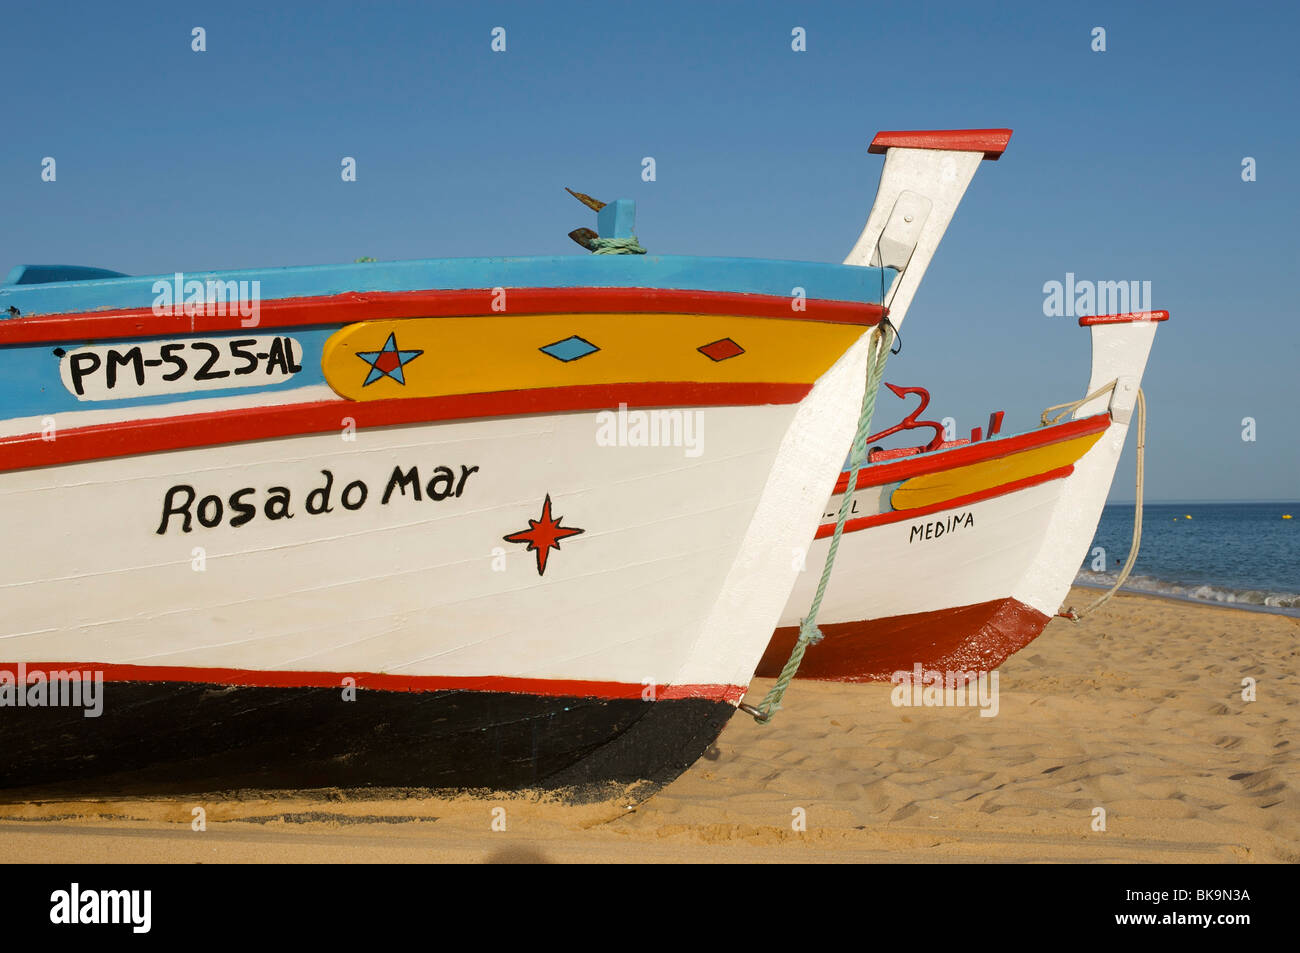 Fishing boats in Armacao de Pera, Algarve, Portugal, Europe - Stock Image